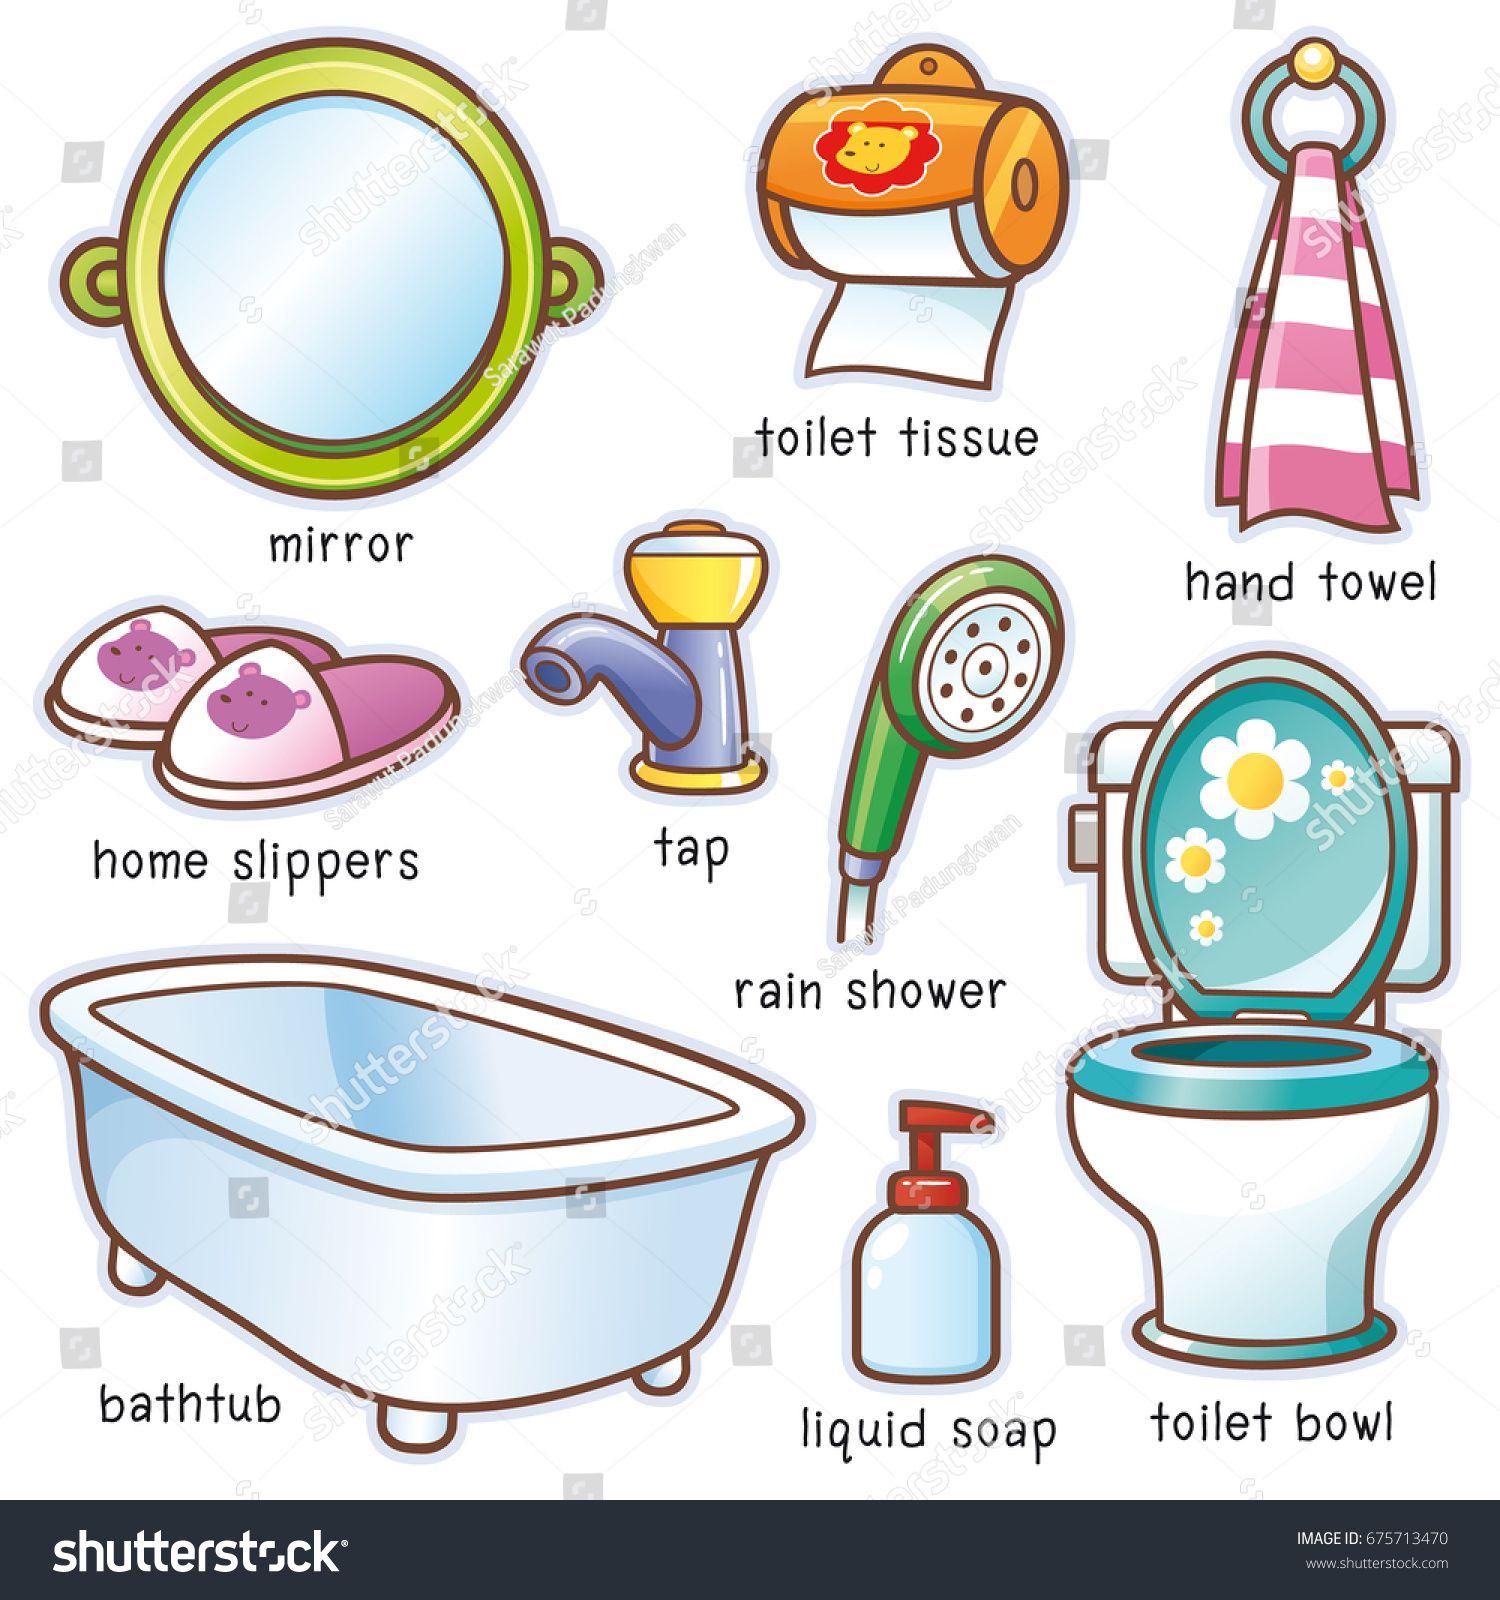 Vector Illustration Of Cartoon Bathroom Element Vocabulary